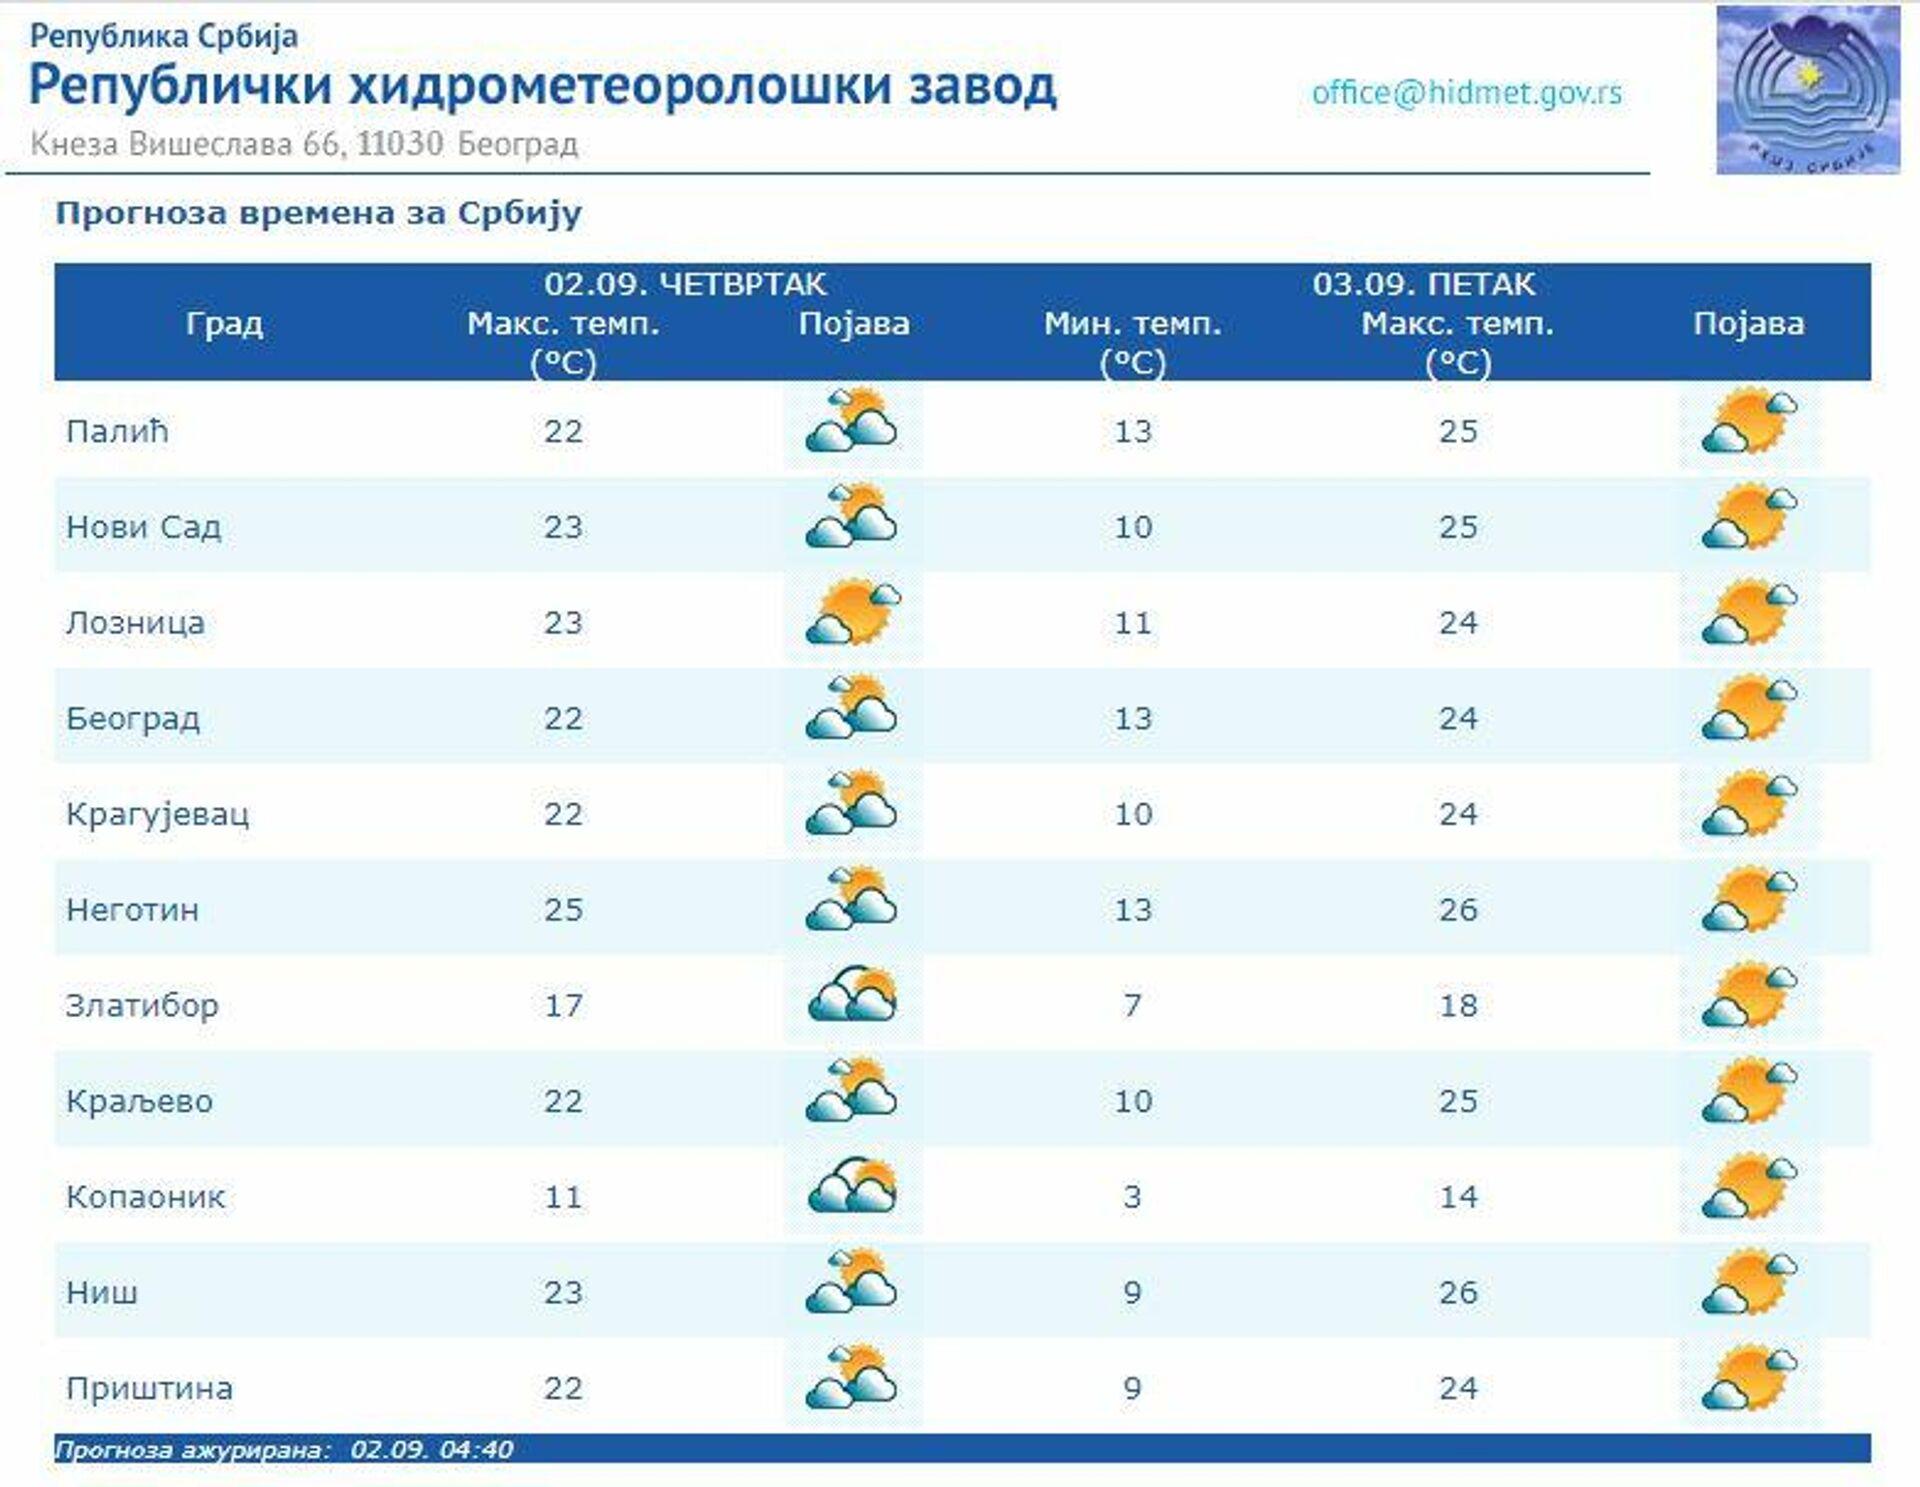 Vremenska prognoza za 2. septembar 2021. - Sputnik Srbija, 1920, 02.09.2021